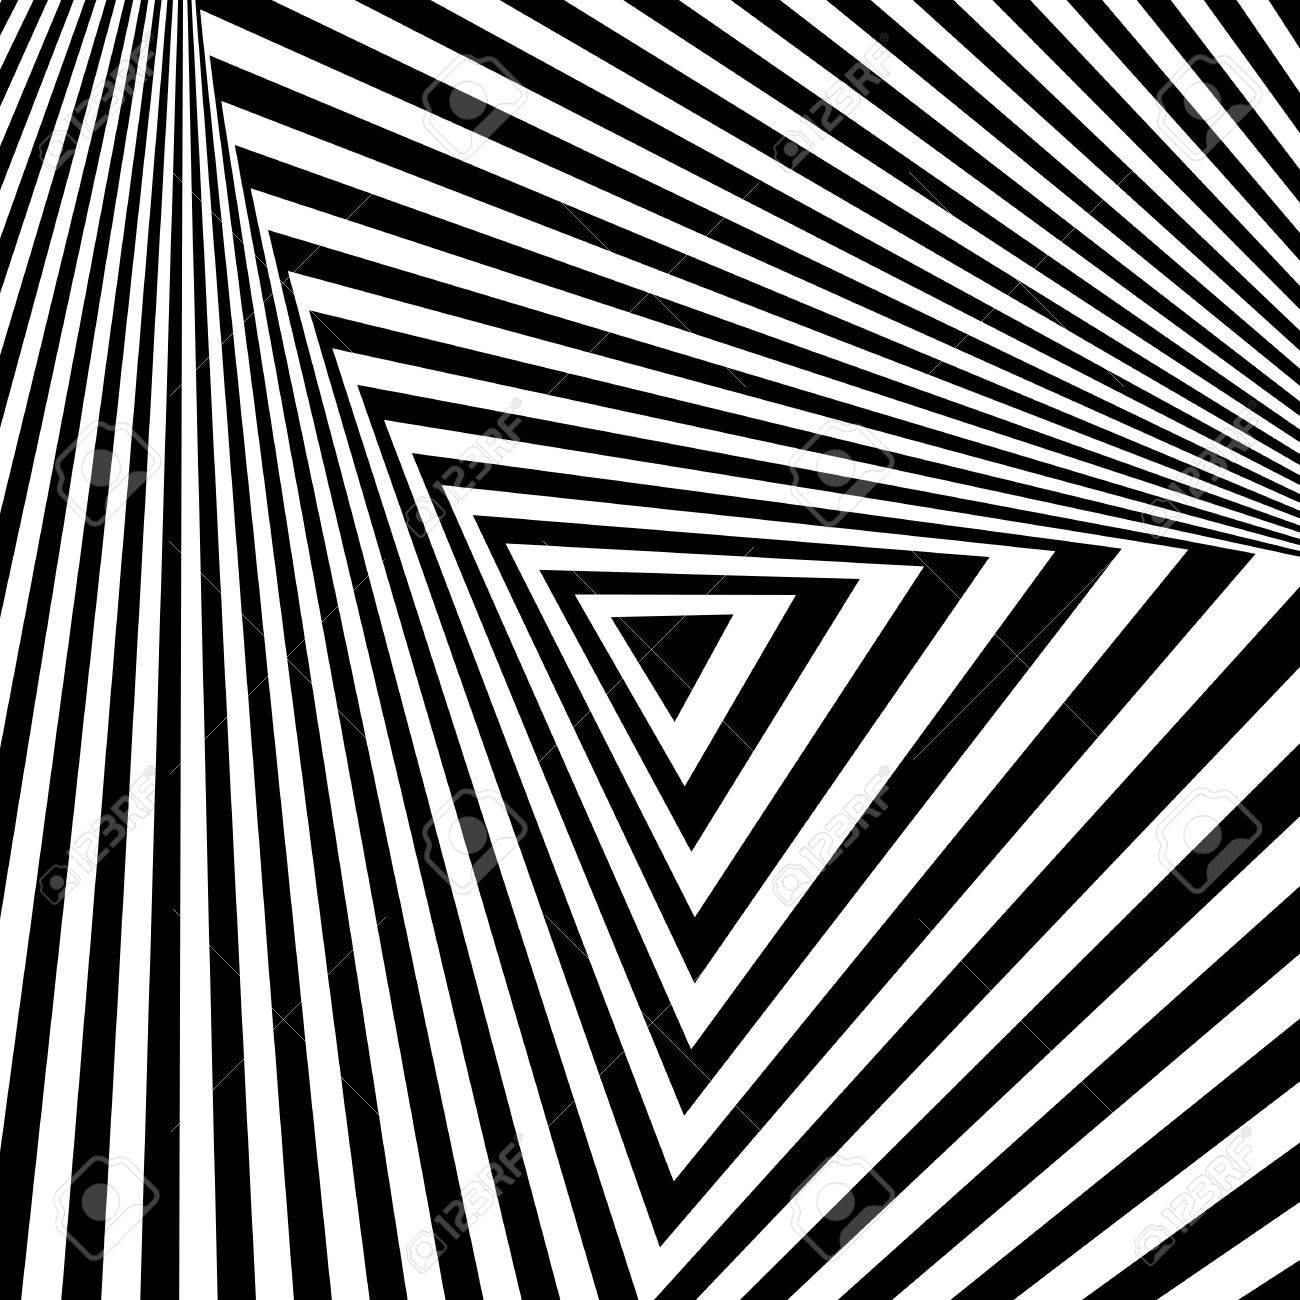 Abstract geometric backdrop in op art design. Vector art. - 26050415